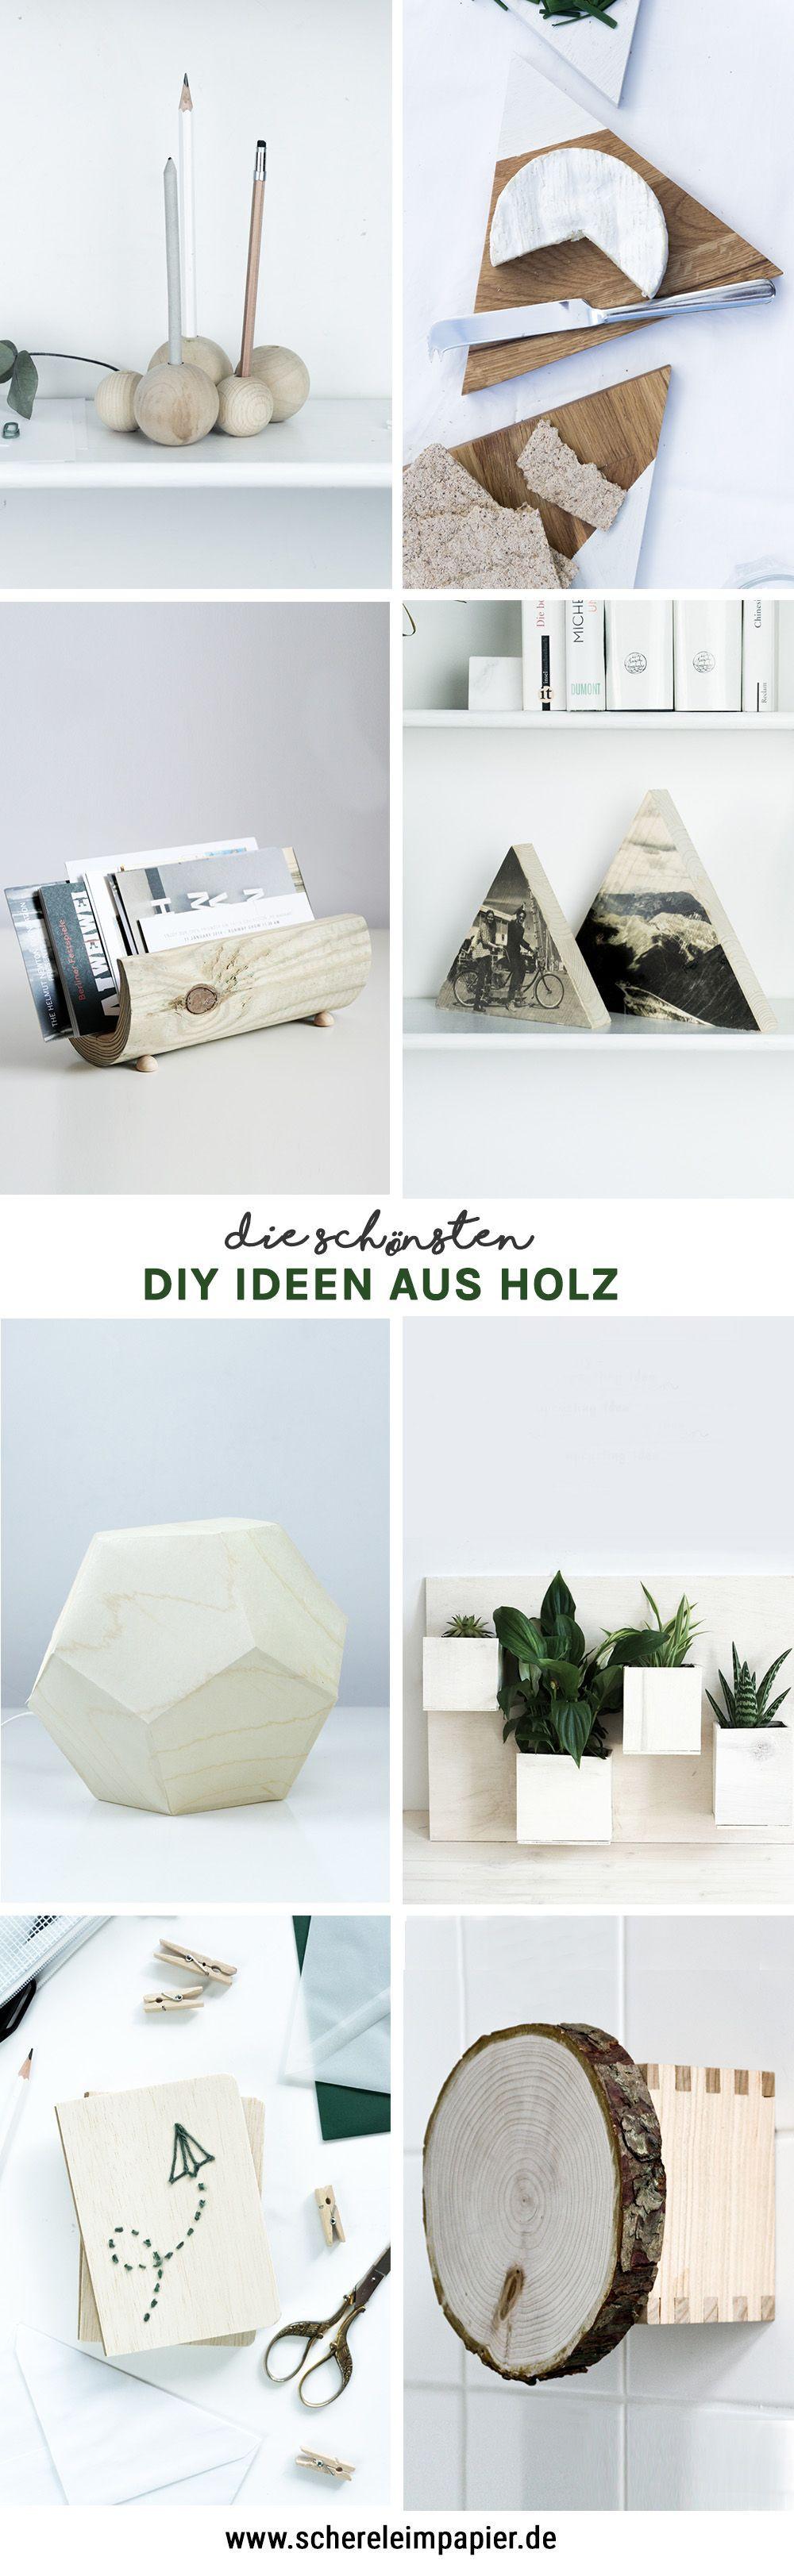 Diy Holz Deko  DIY Holz DIY Holz